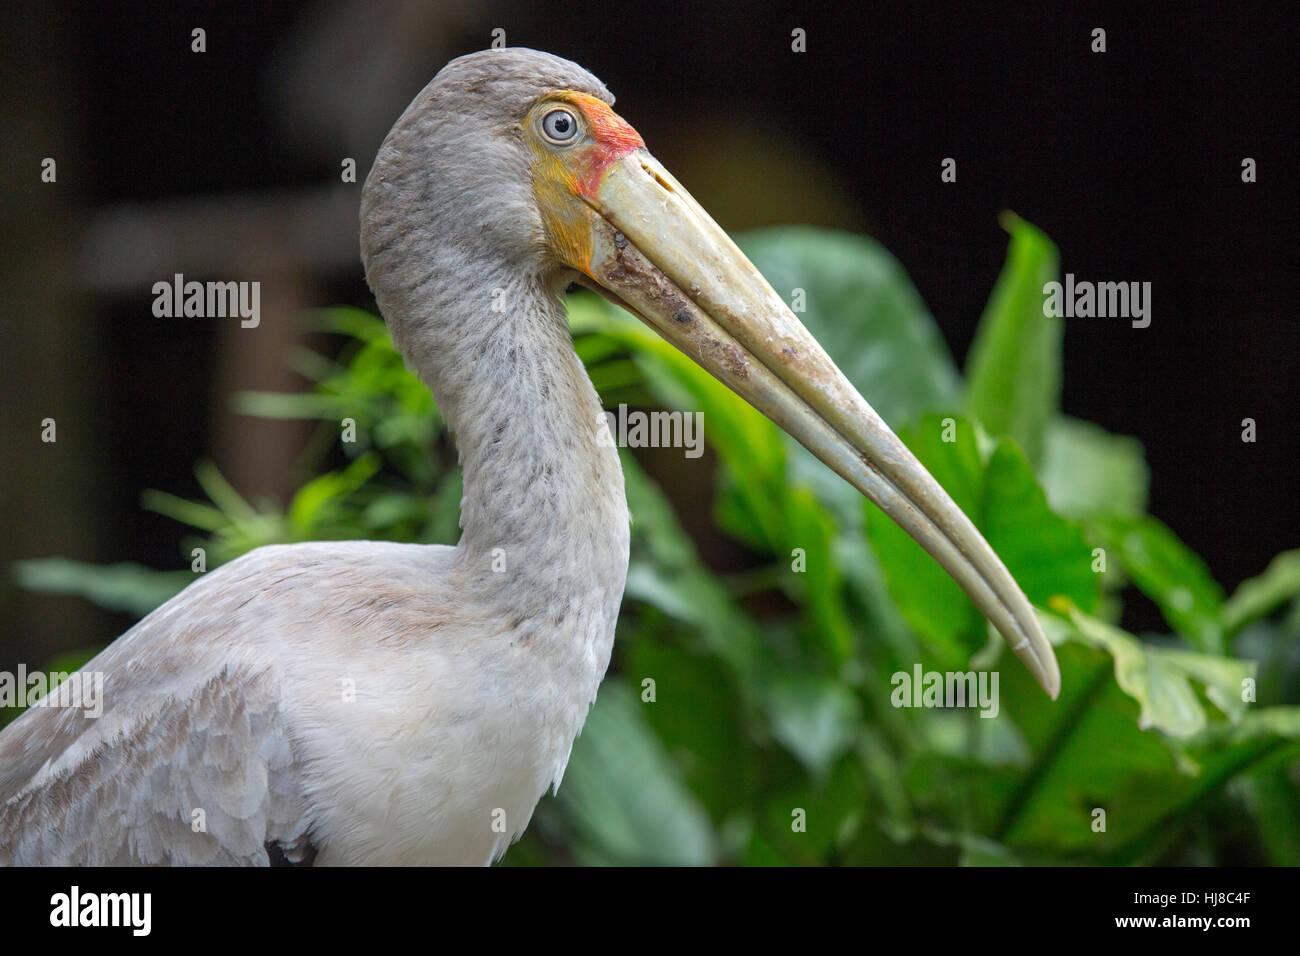 Yellow billed stork - Mycteria ibis - portrait close up - Stock Image